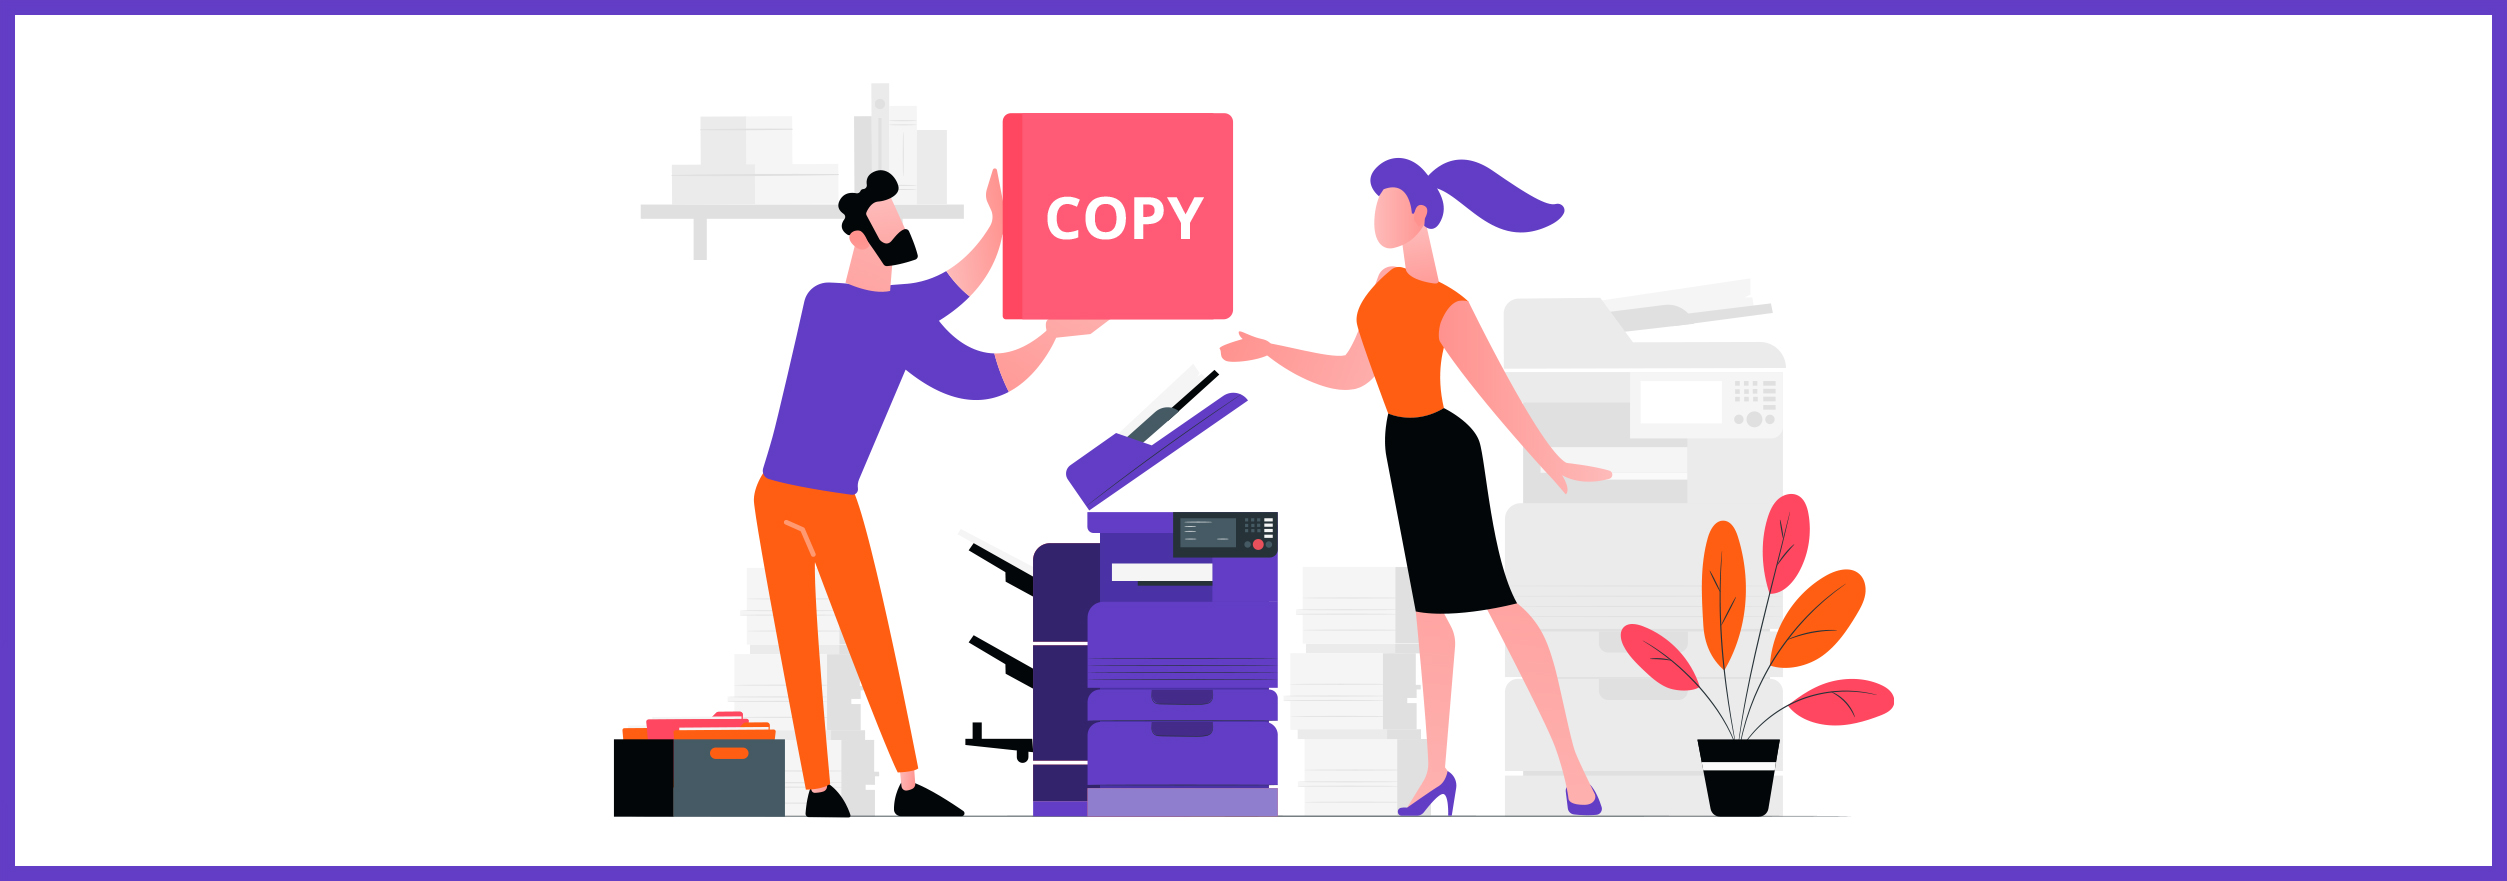 50+ Ad Copy Examples Guaranteed To Increase Clicks